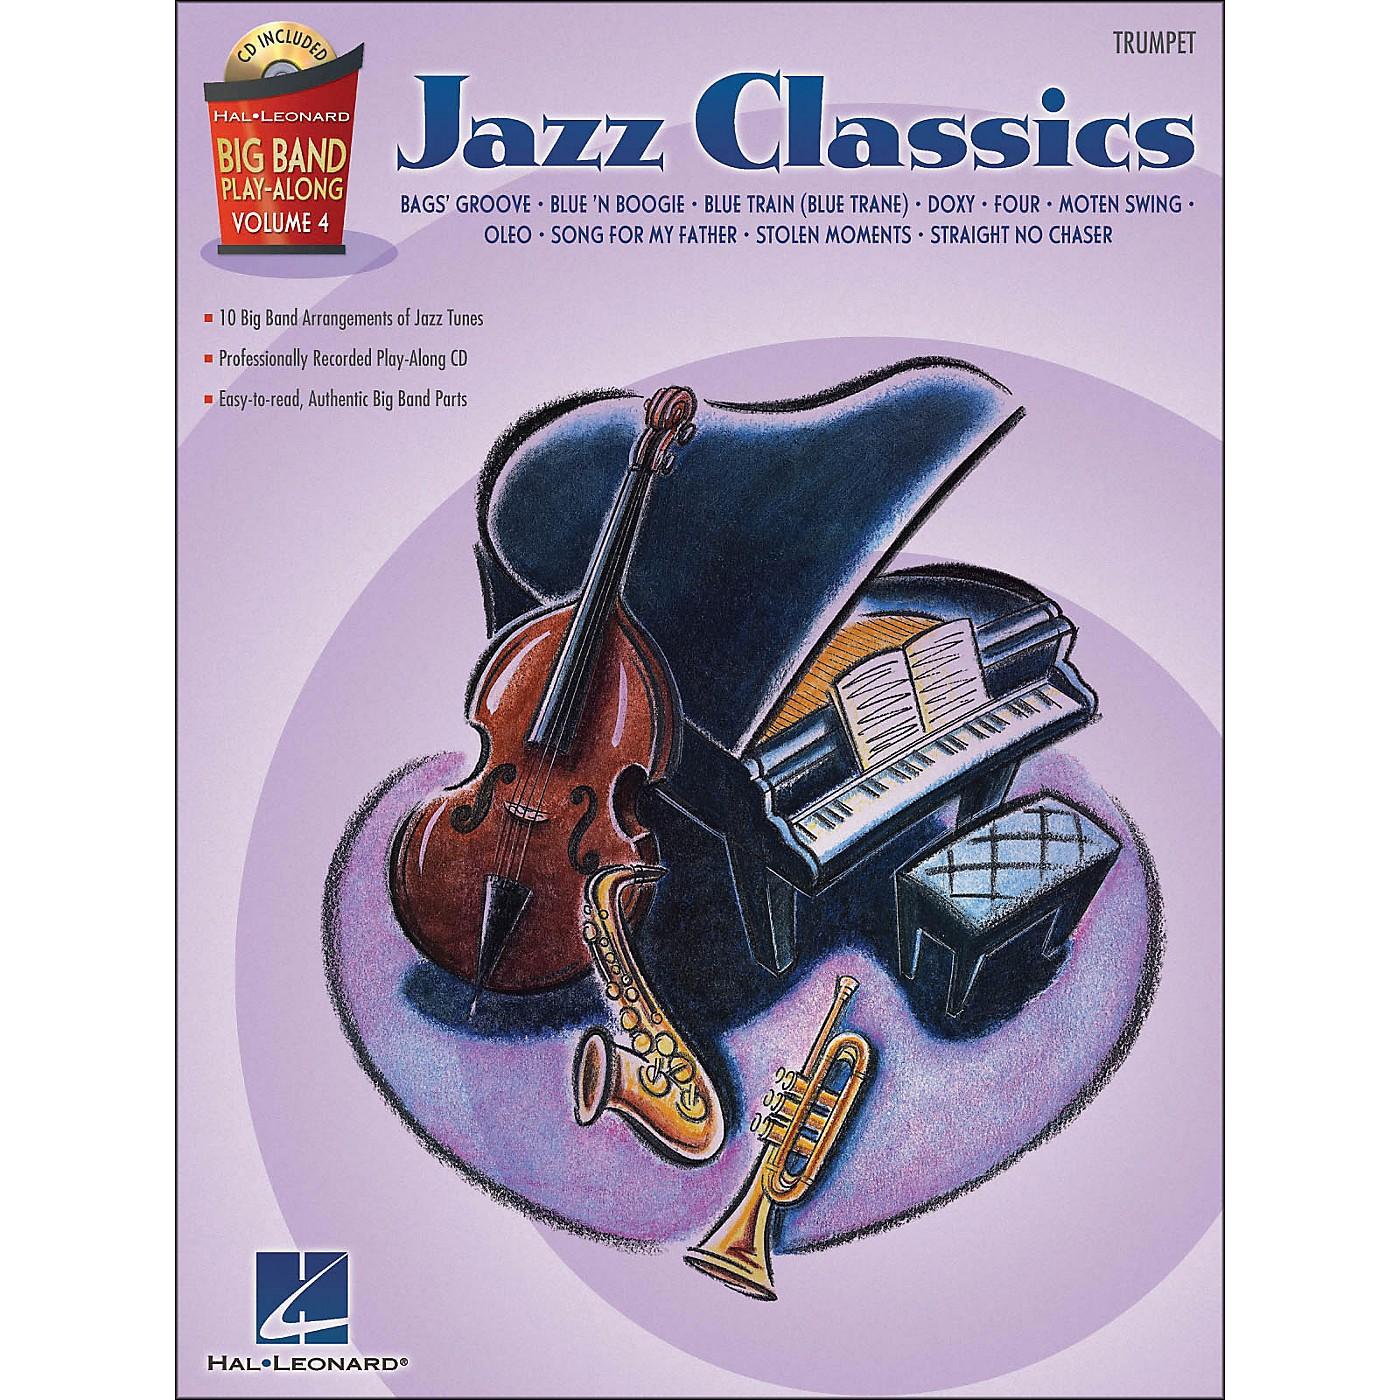 Hal Leonard Jazz Classics - Big Band Play-Along Vol. 4 Trumpet thumbnail